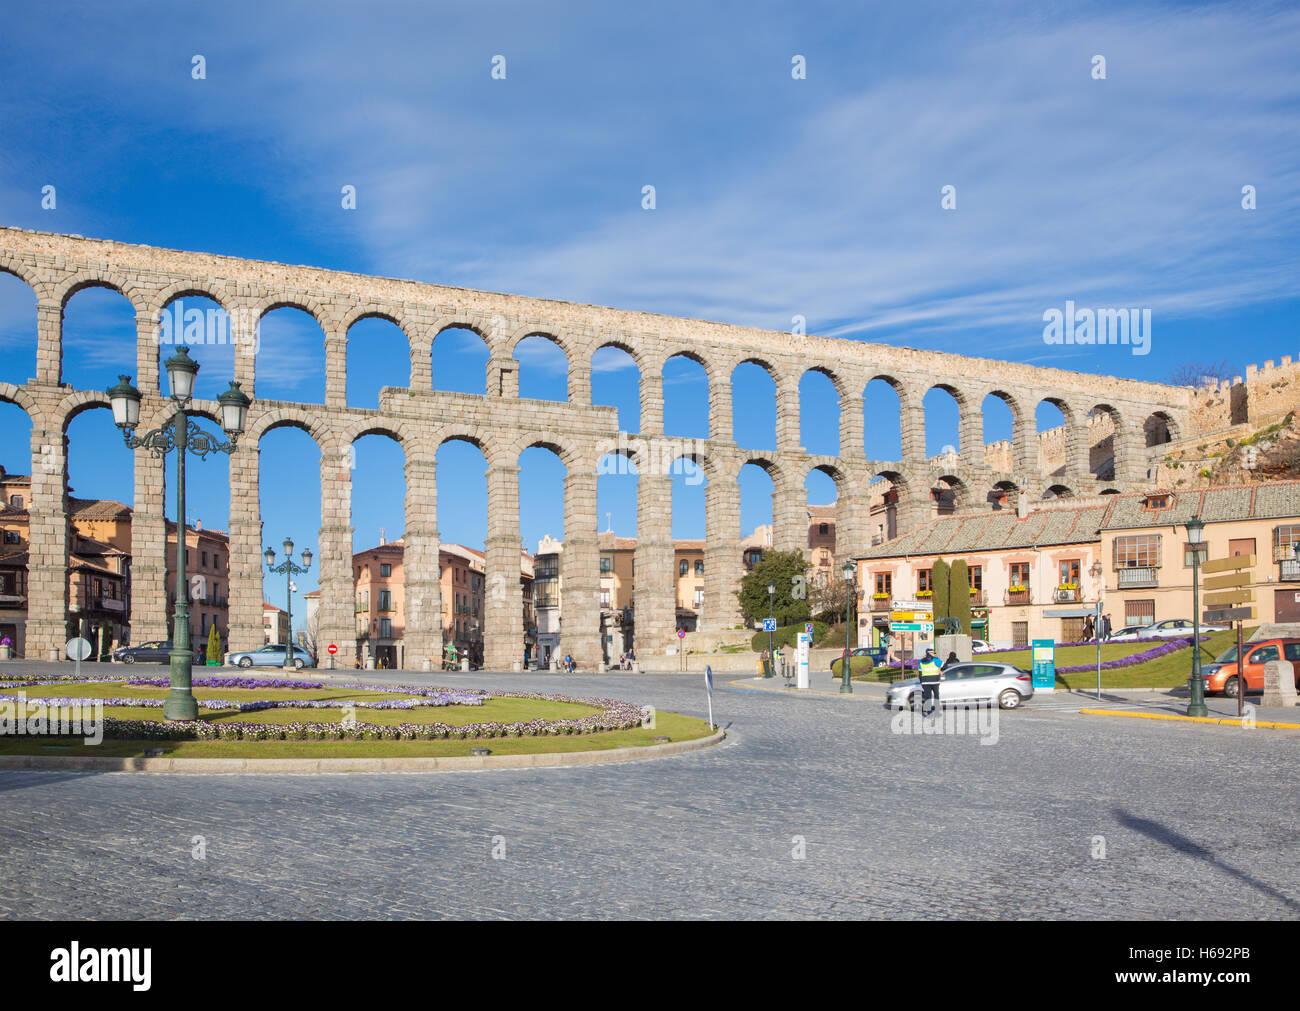 SEGOVIA, SPAIN, APRIL - 14, 2016: Aqueduct of Segovia and Plaza del Artilleria. - Stock Image